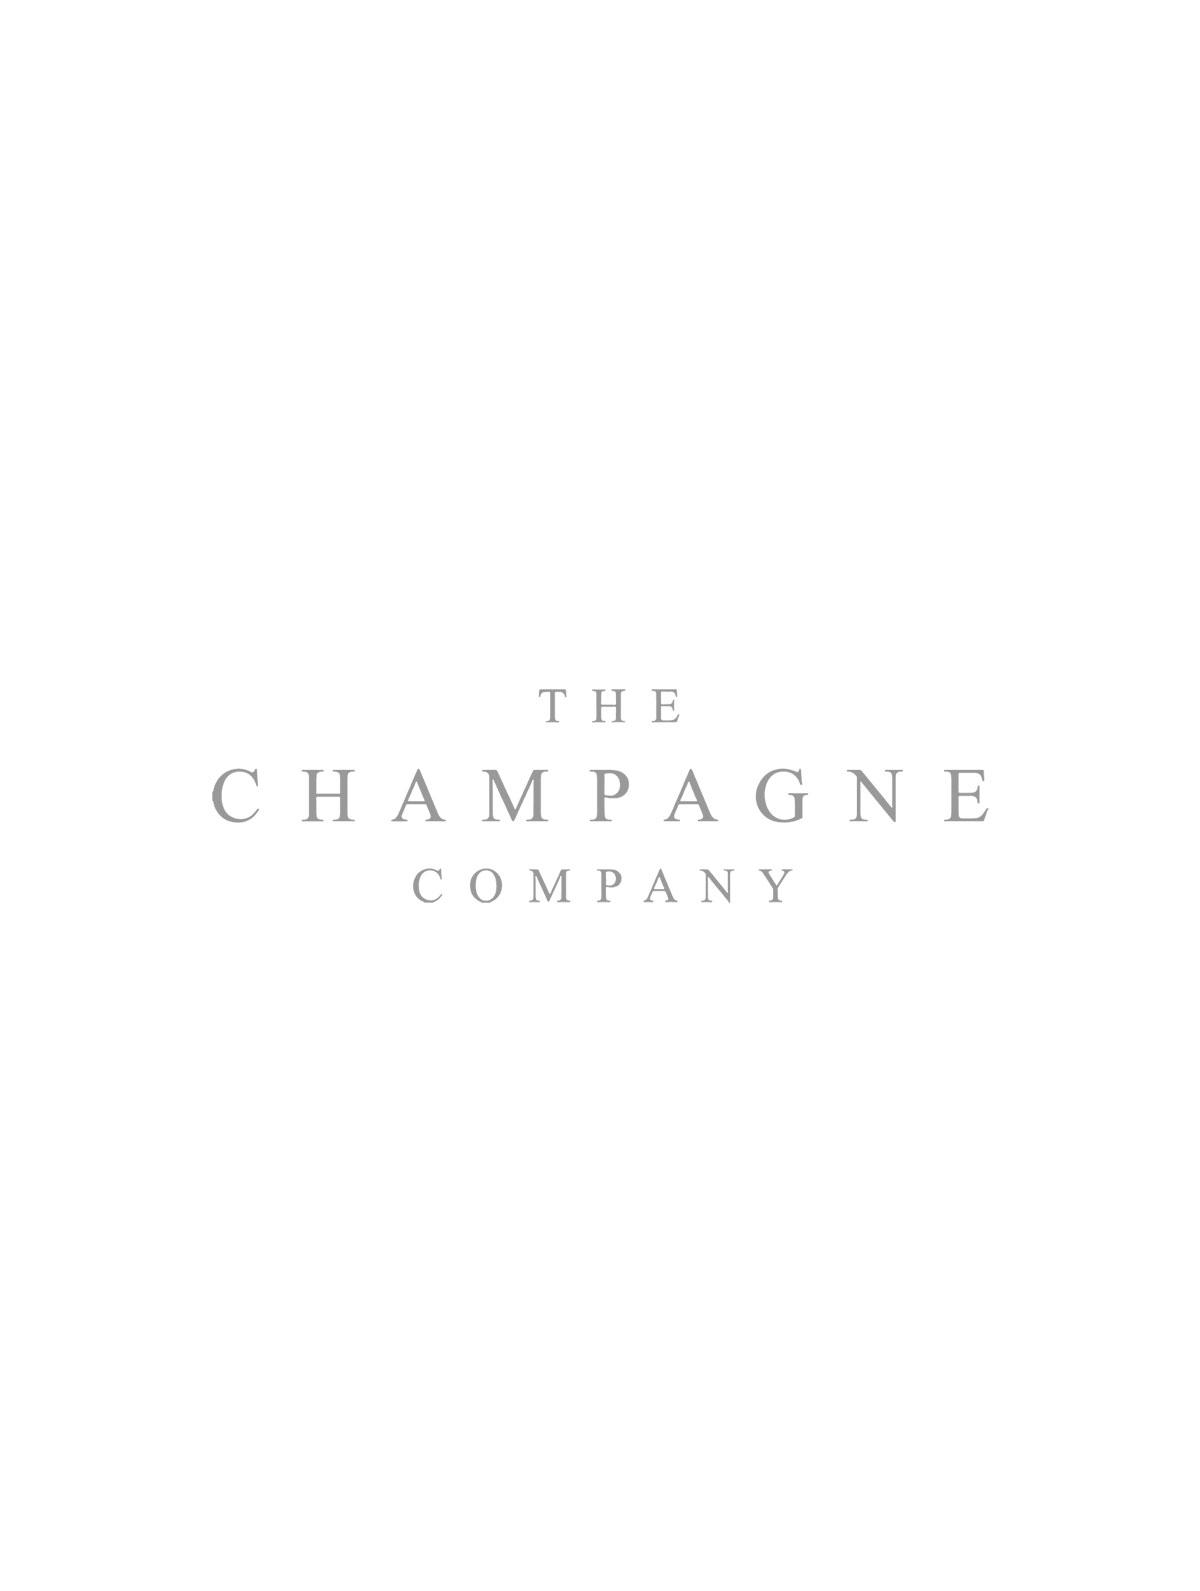 Boekenhoutskloof The Chocolate Block 2016 South Africa Wine 75cl